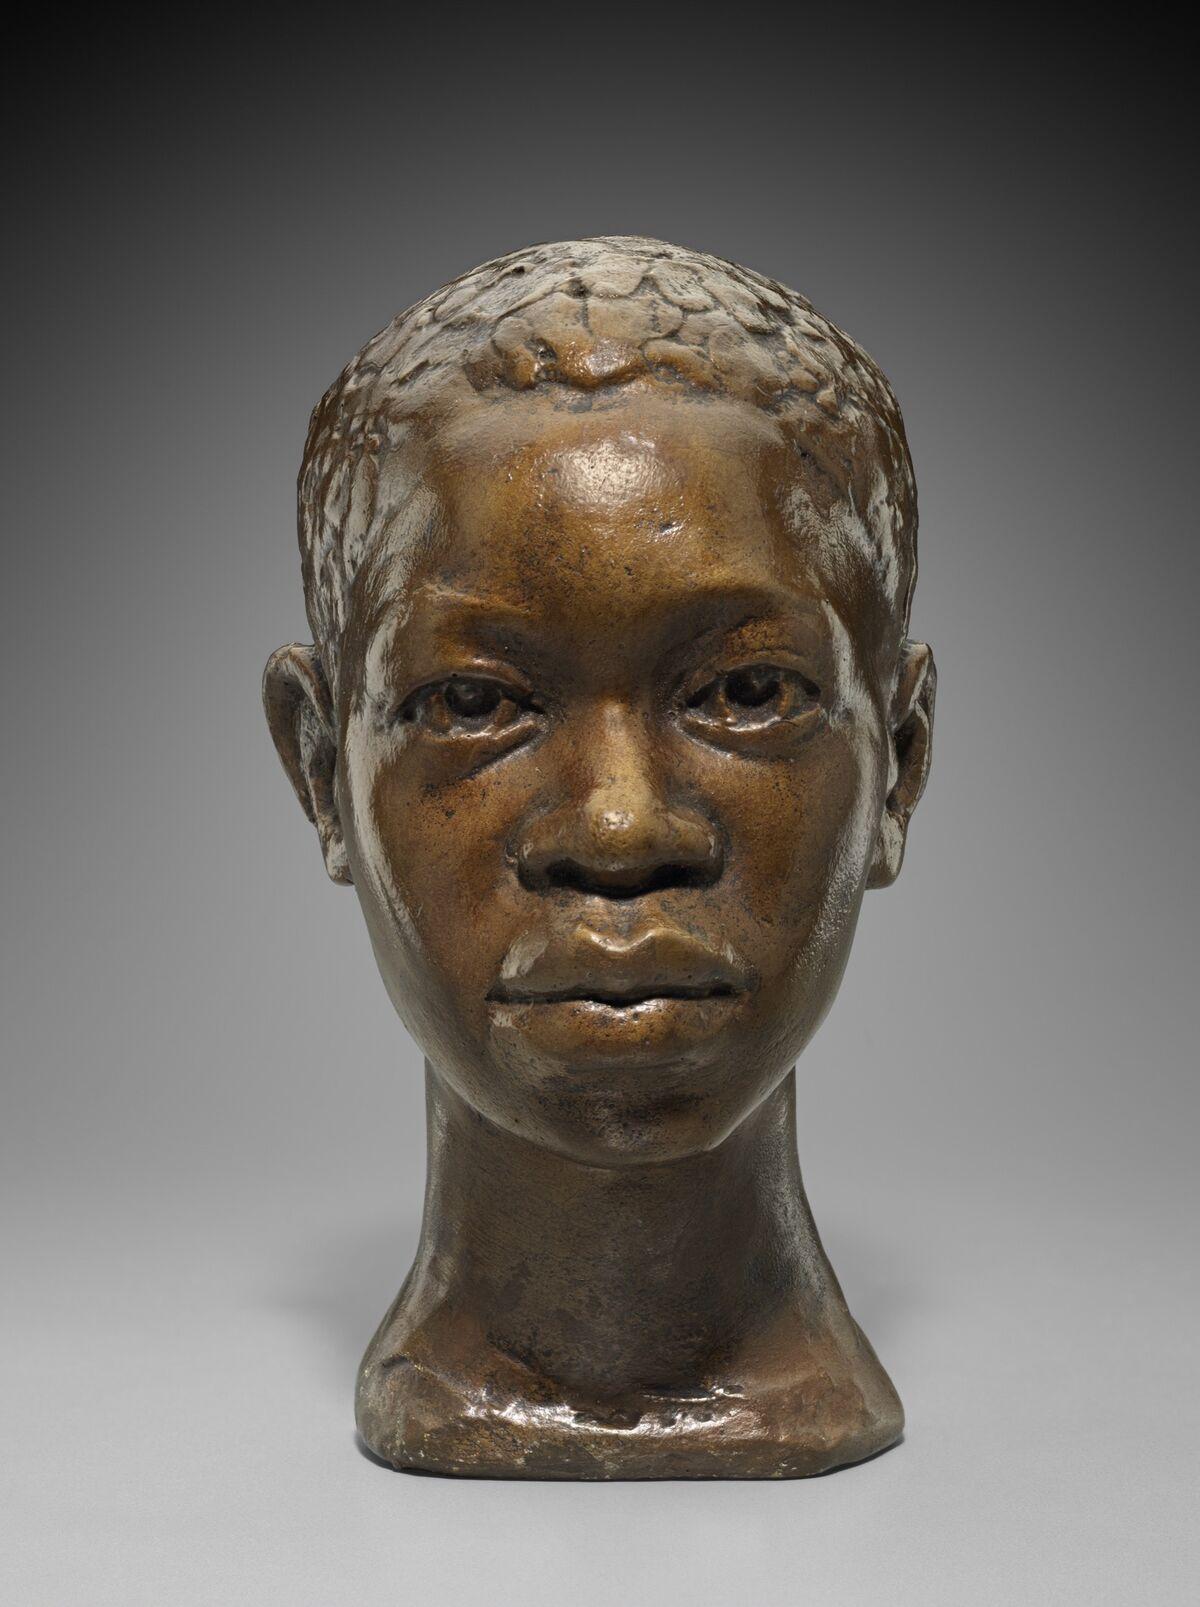 Augusta Savage, Portrait Head of John Henry, c. 1940. Photograph © 2018 Museum of Fine Arts Boston.